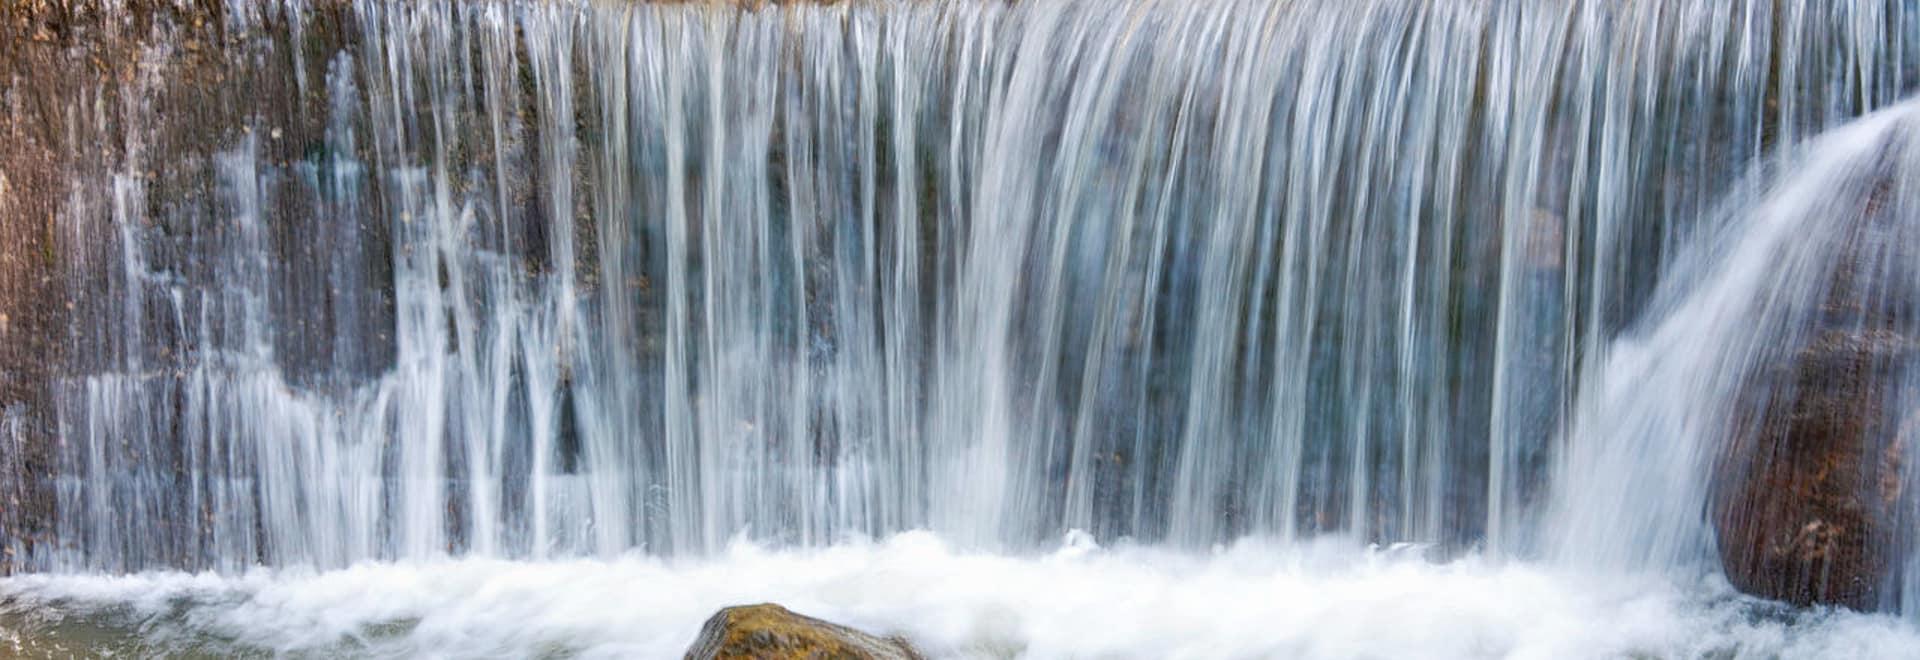 1493365198_1280px-ban_jhakri_falls_-_gangtok.jpg